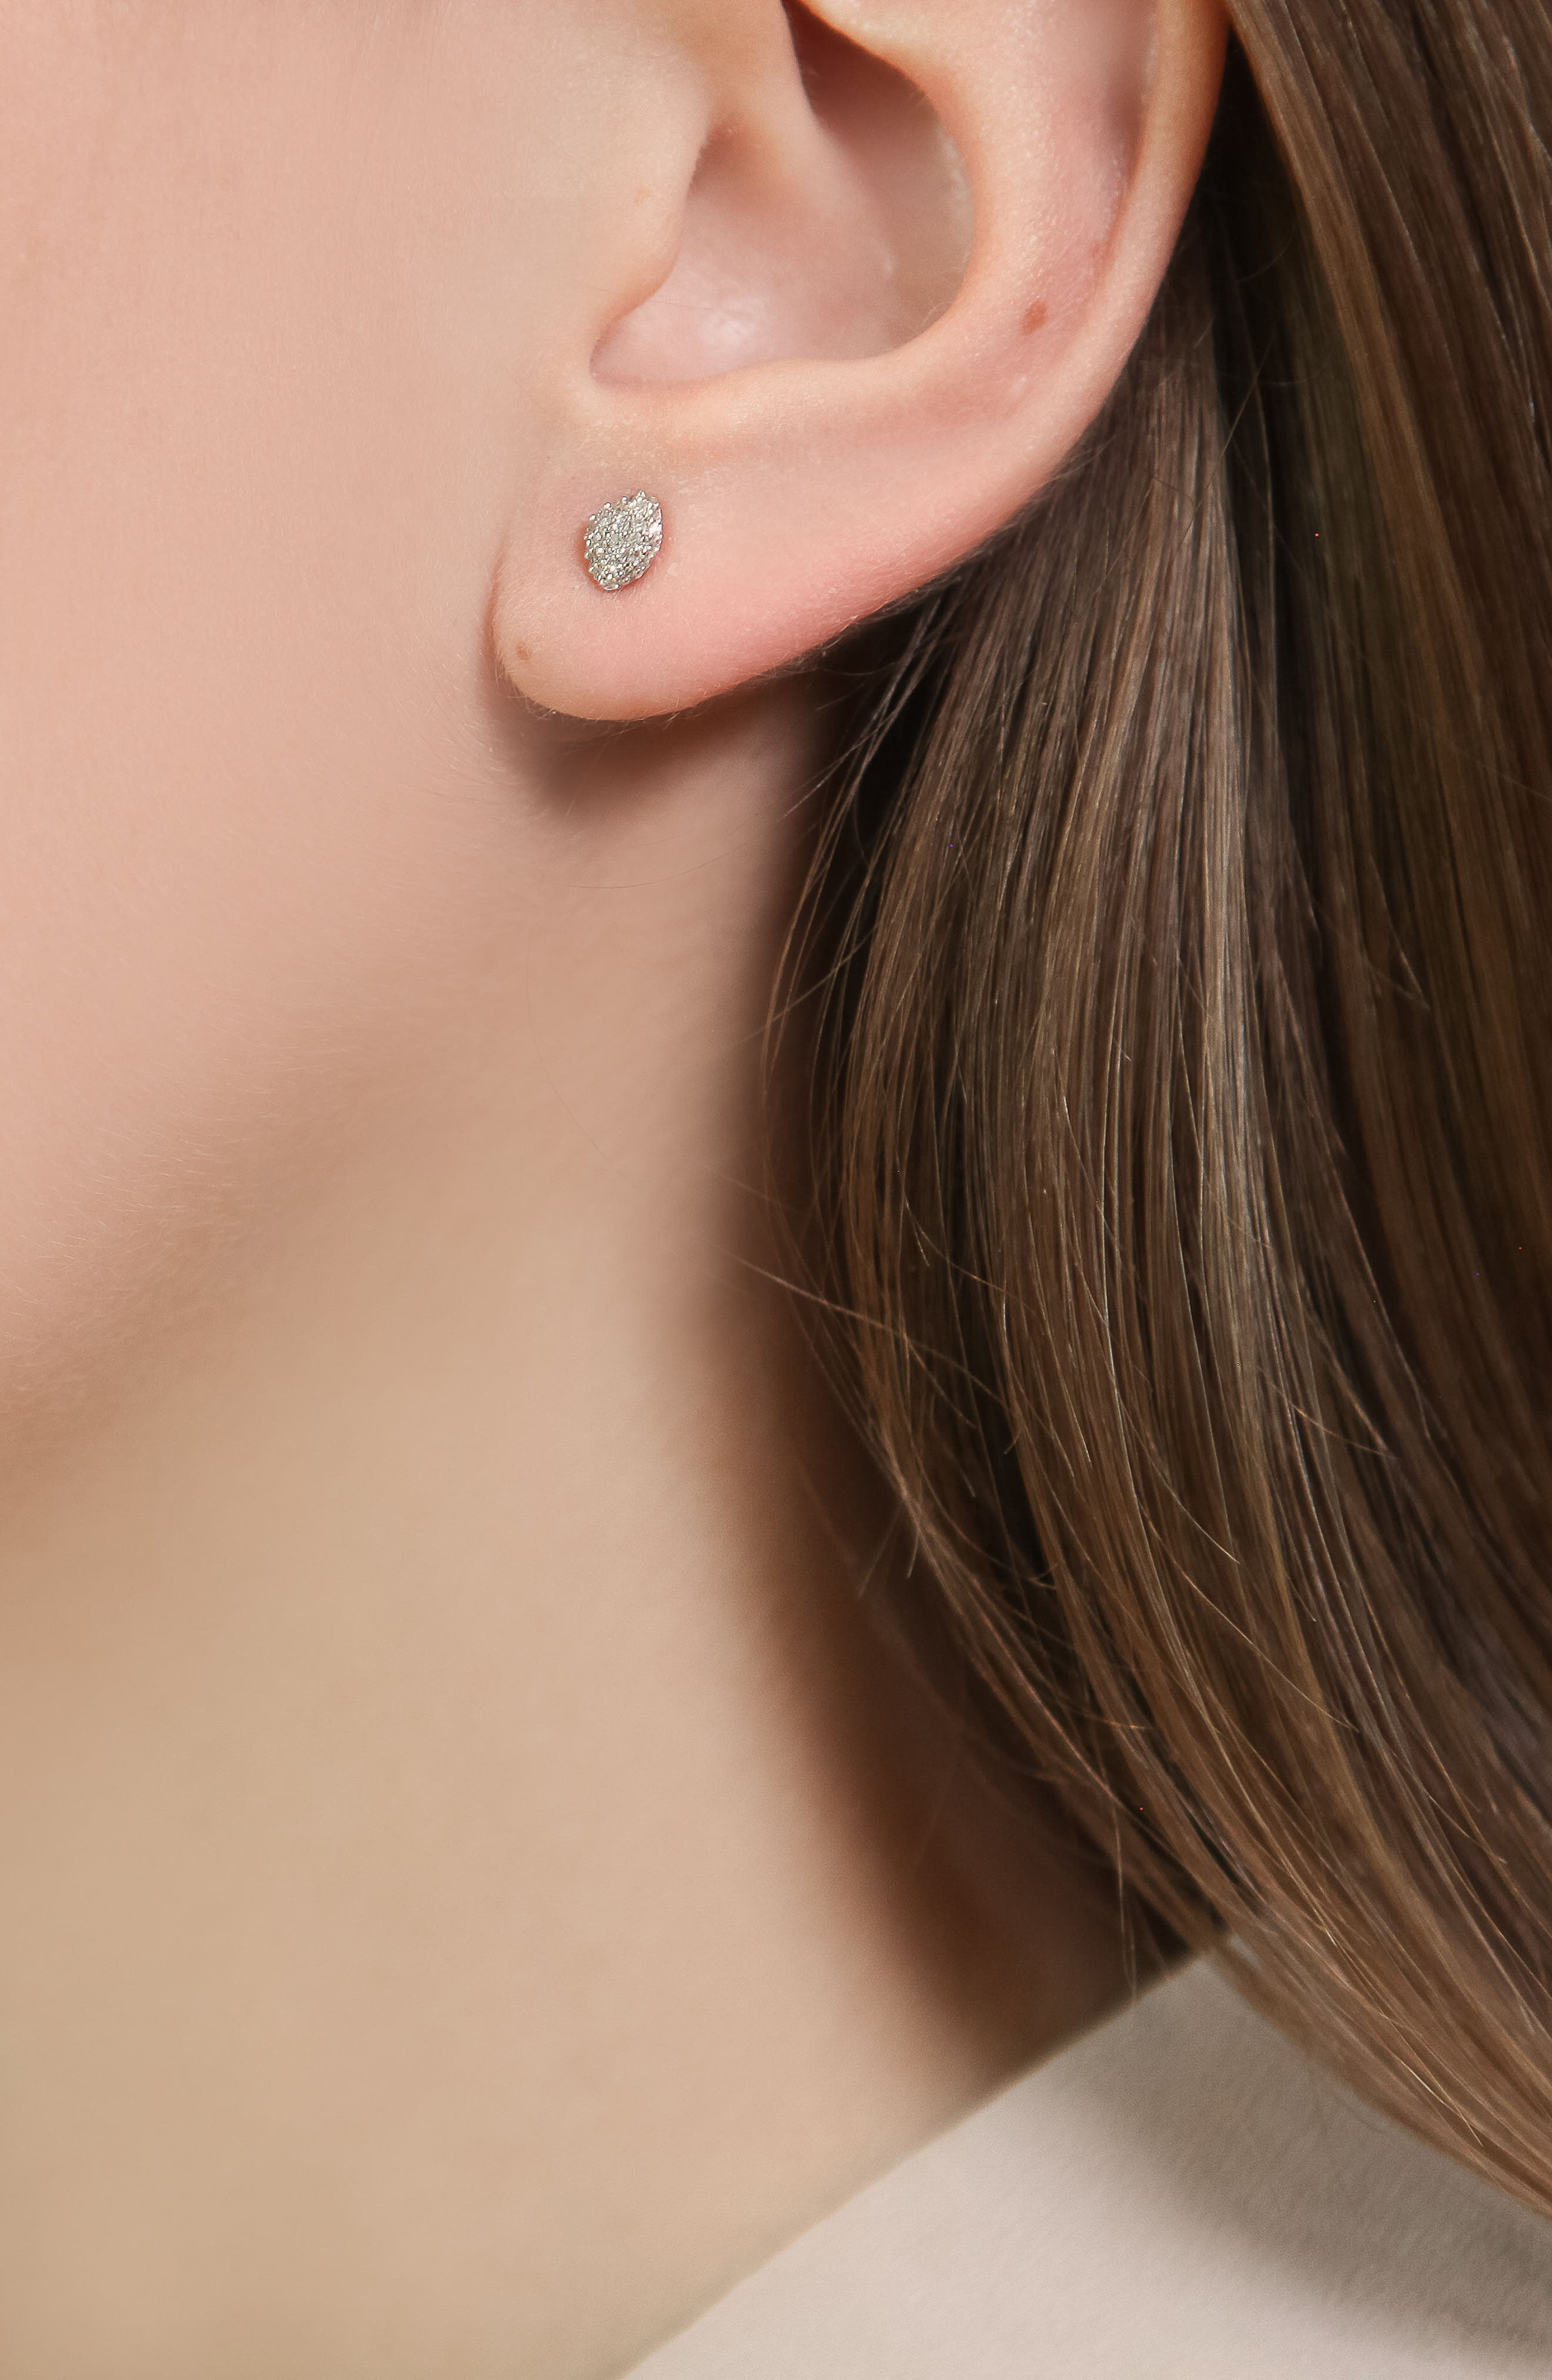 MONICA VINADER, Nura Mini Diamond Stud Earrings, Alternate thumbnail 4, color, ROSE GOLD/ DIAMOND